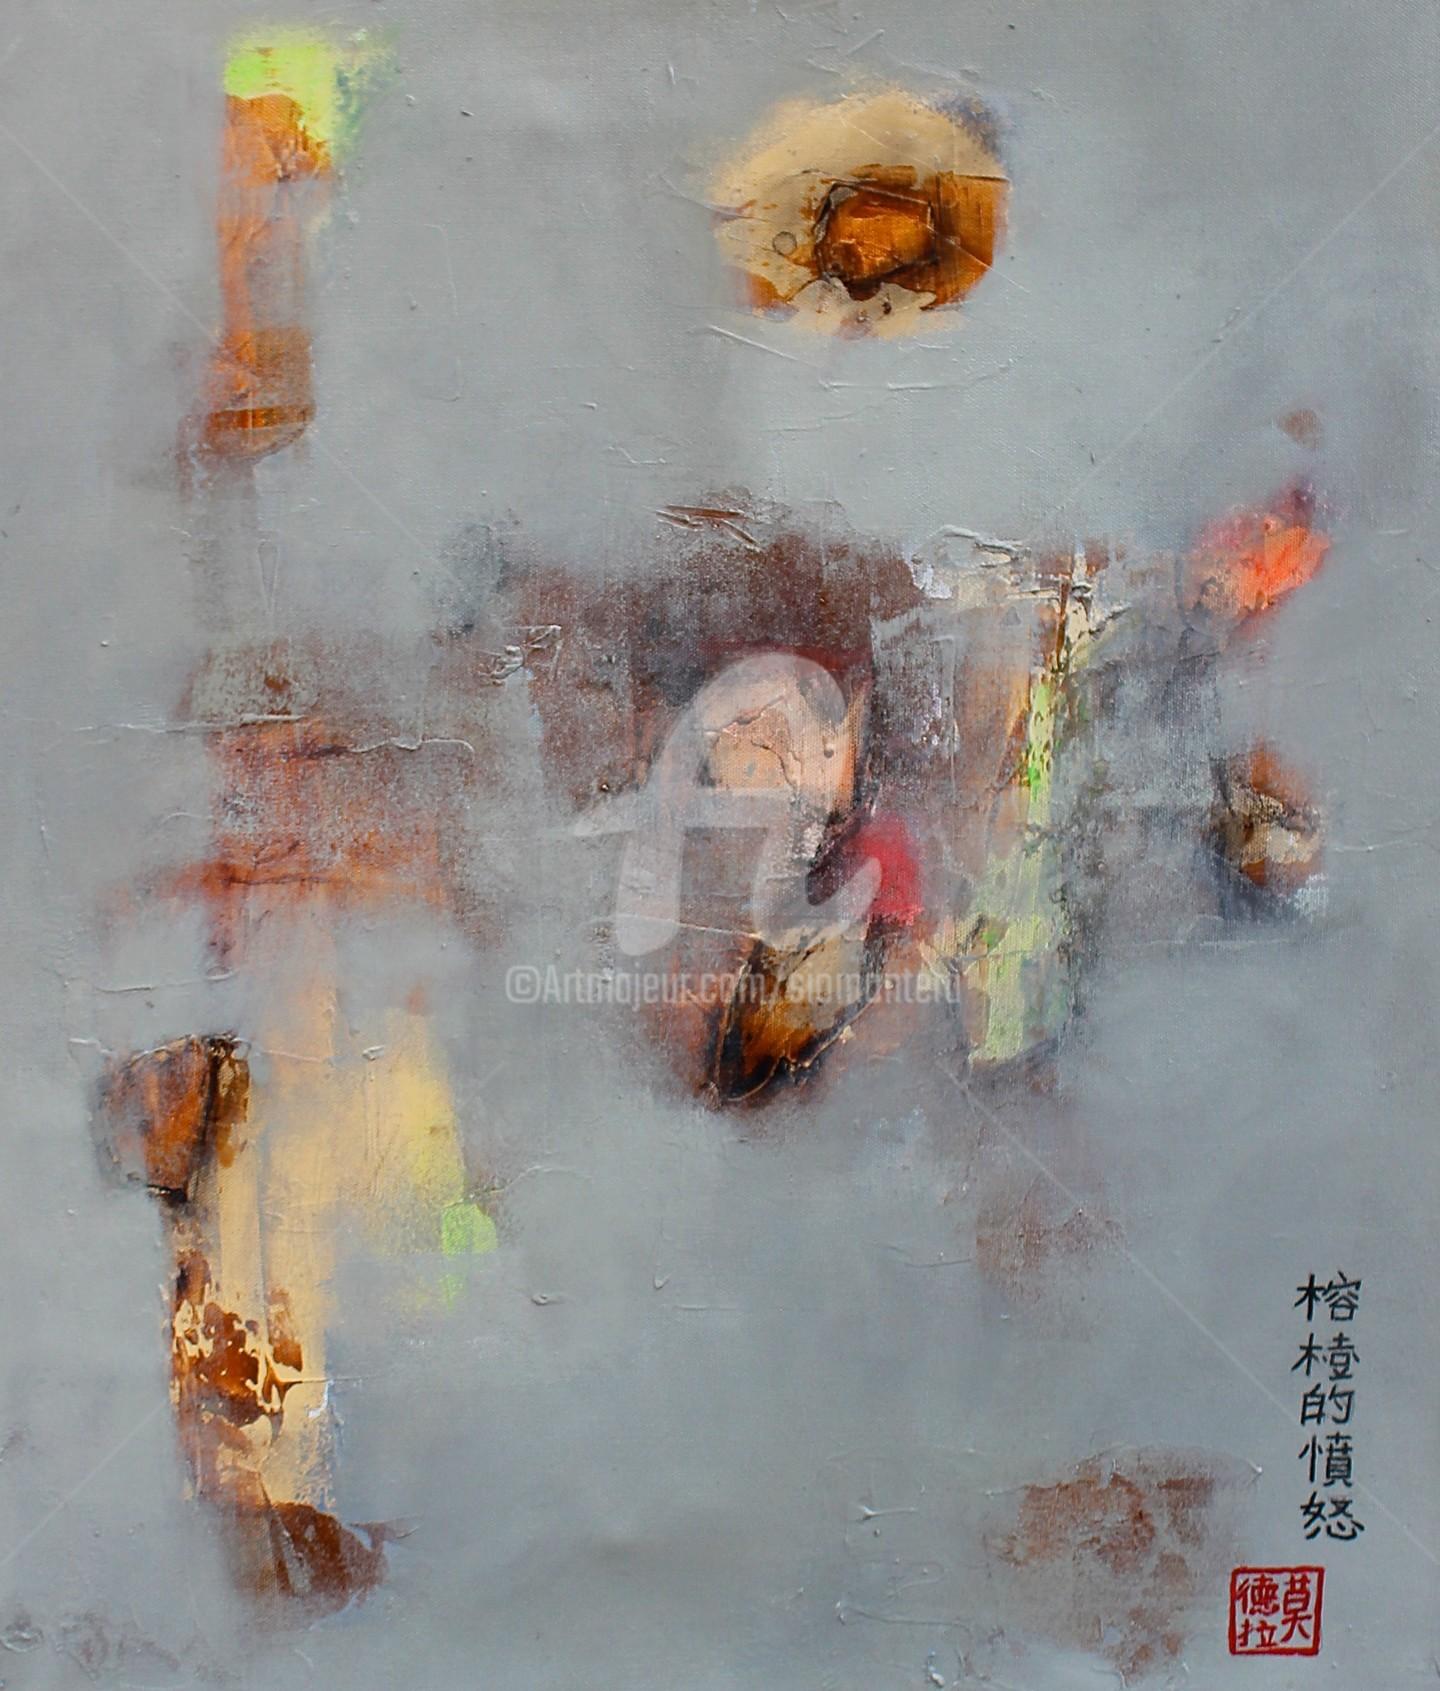 Sio Montera - Wrath of the Banyan Tree 榕樹的憤怒